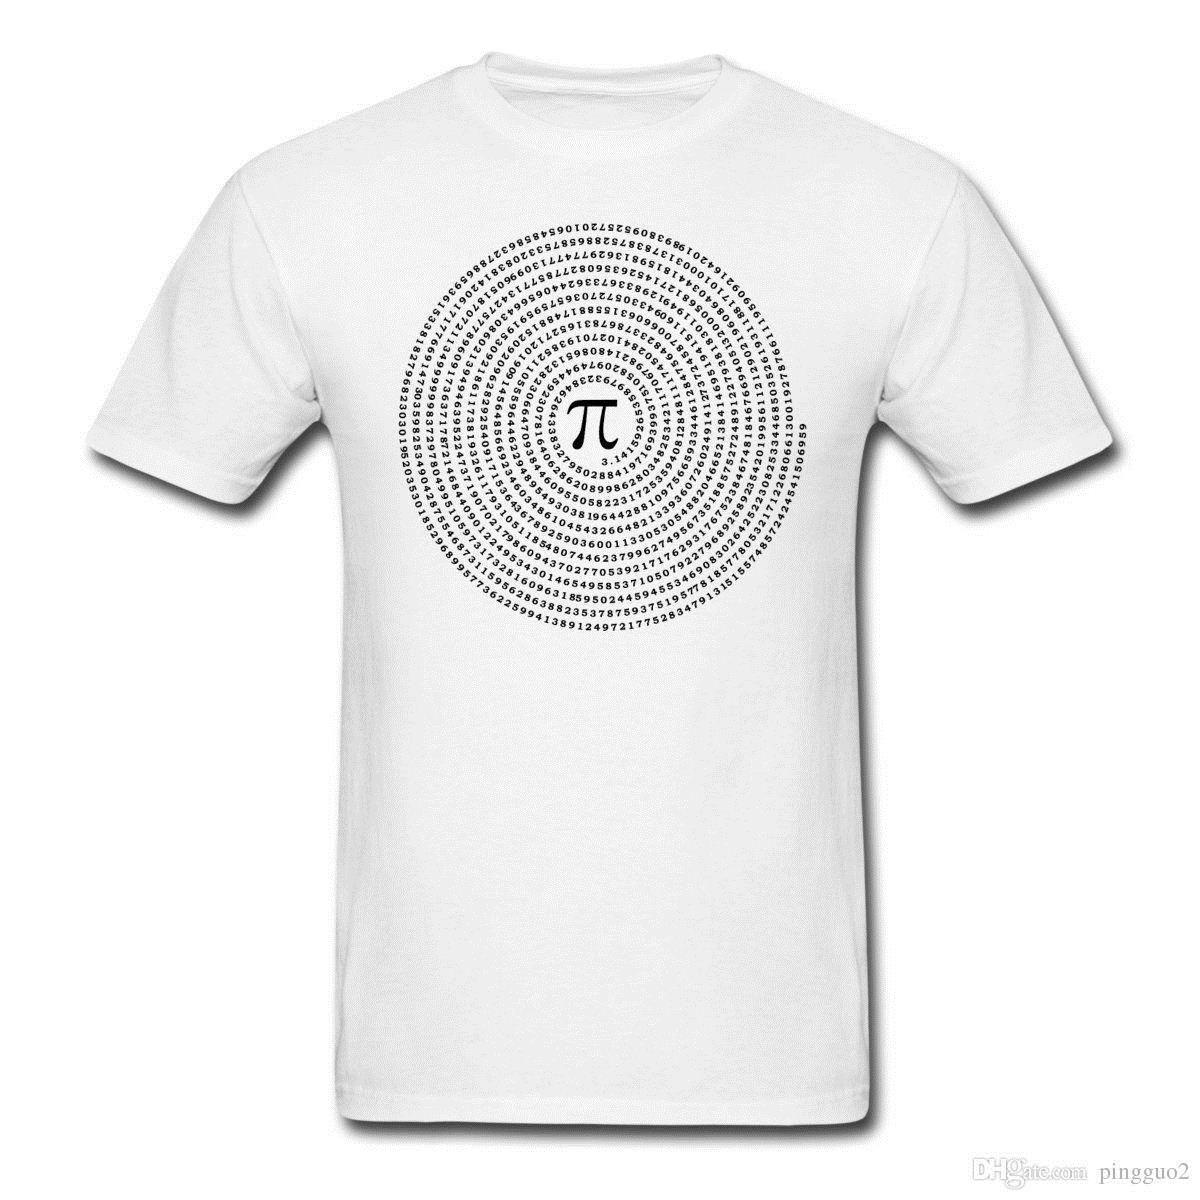 72edfef2f Pi Spiral Men's T-Shirt New Metal Short Sleeve Casual Shirt Great Discount  Cotton Men Tee Short Sleeve T Shirt Tops